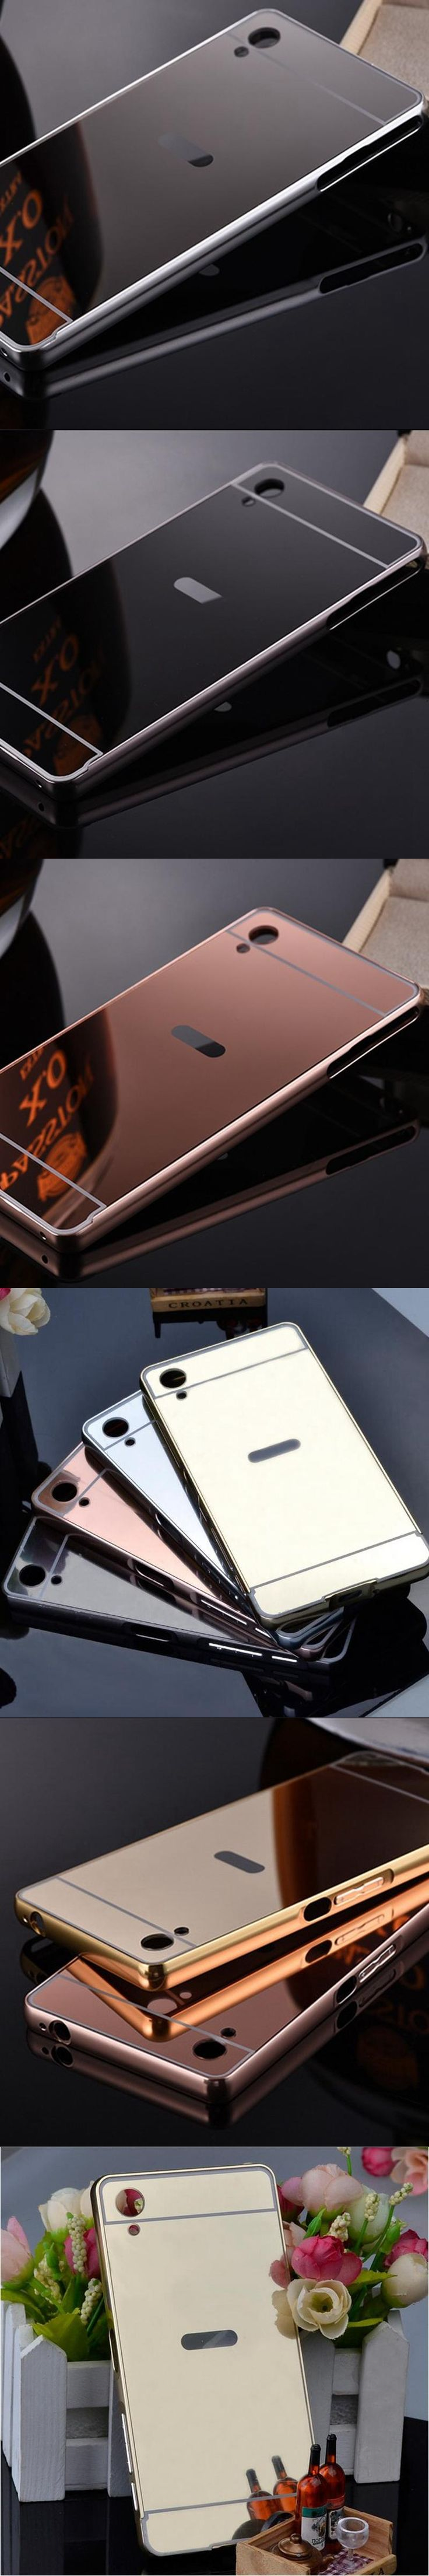 Fundas Experia aqua Cases Luxury Aluminum Metal Frame Mirror Back Cover For Sony Xperia pact